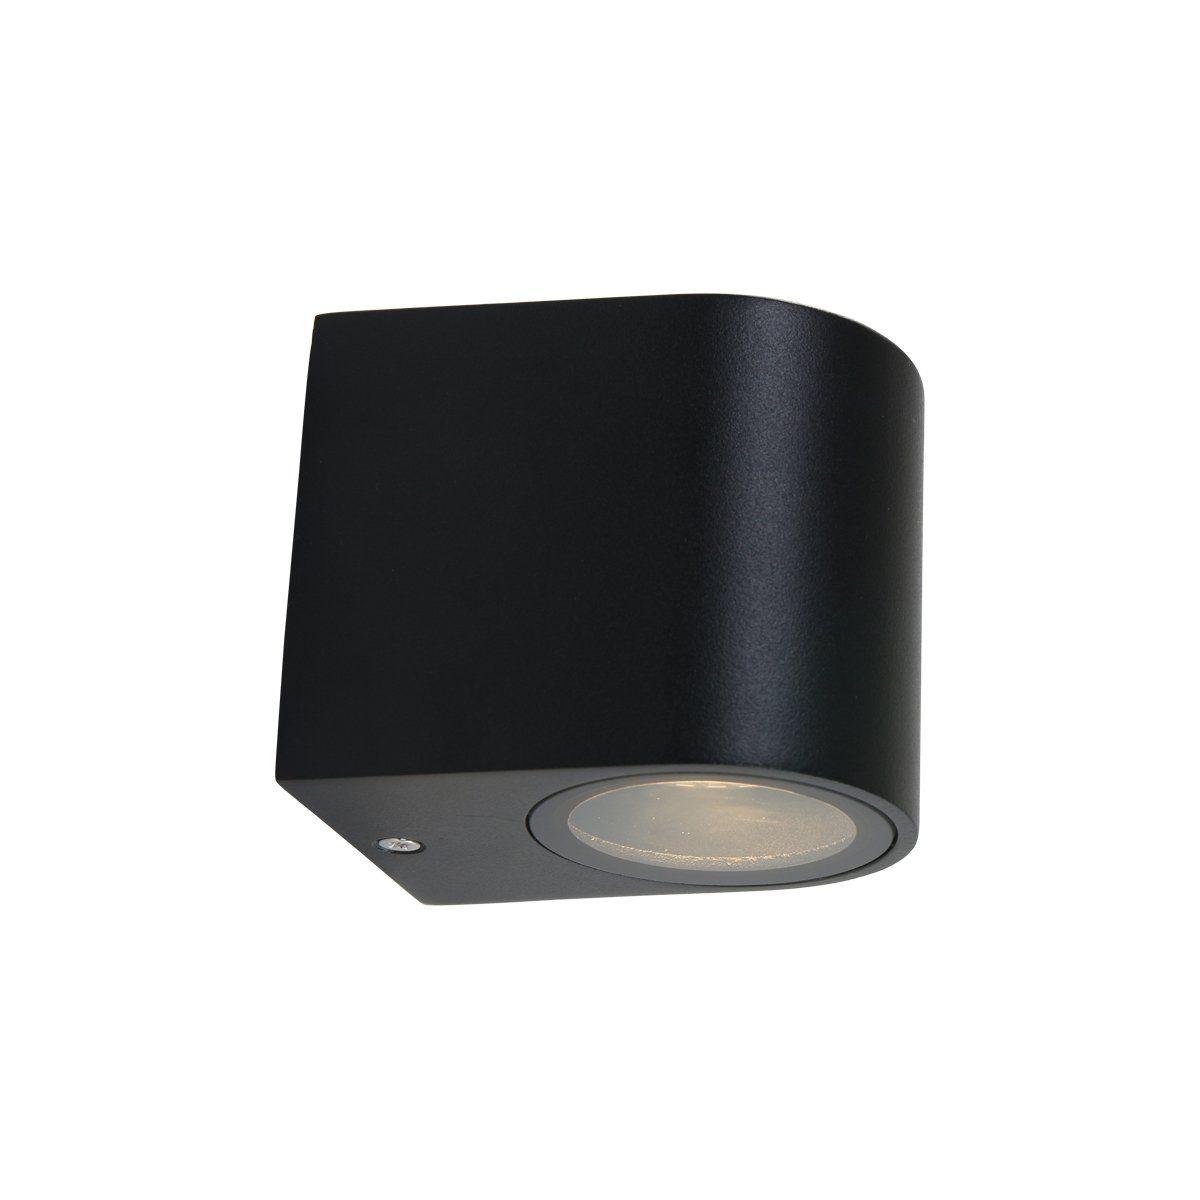 Steinhauer buiten wandlamp Logan cilinder - zwart